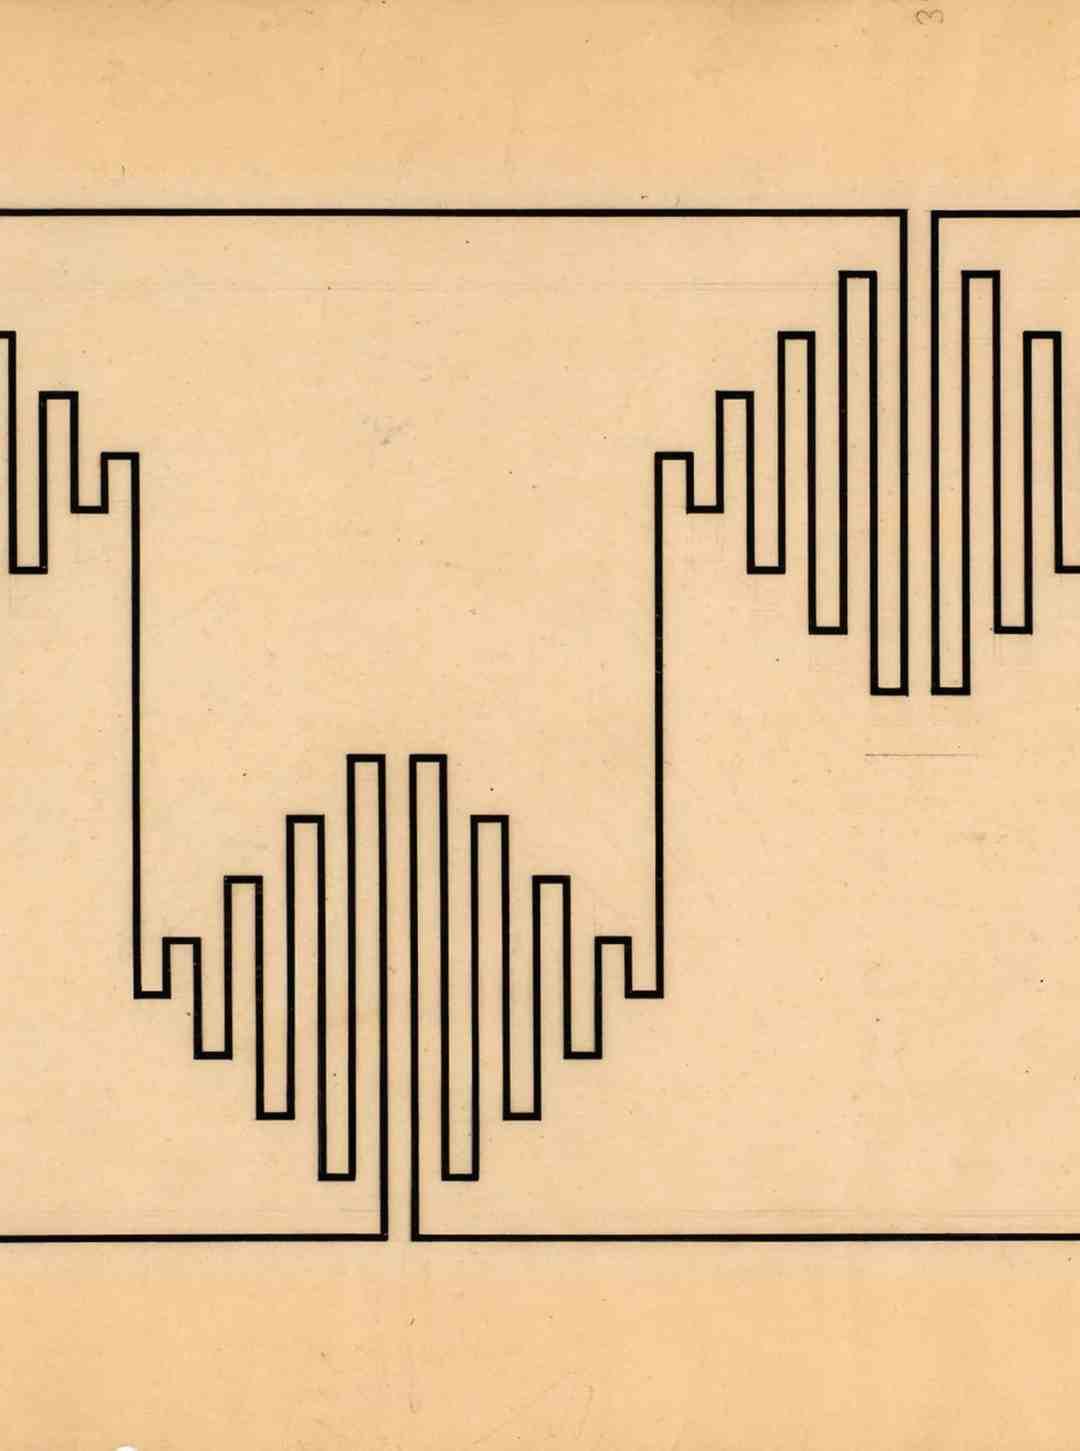 Wacław Szpakowski, A000000, 1927, ink on transparent paper, Galerie Berinson, detail.